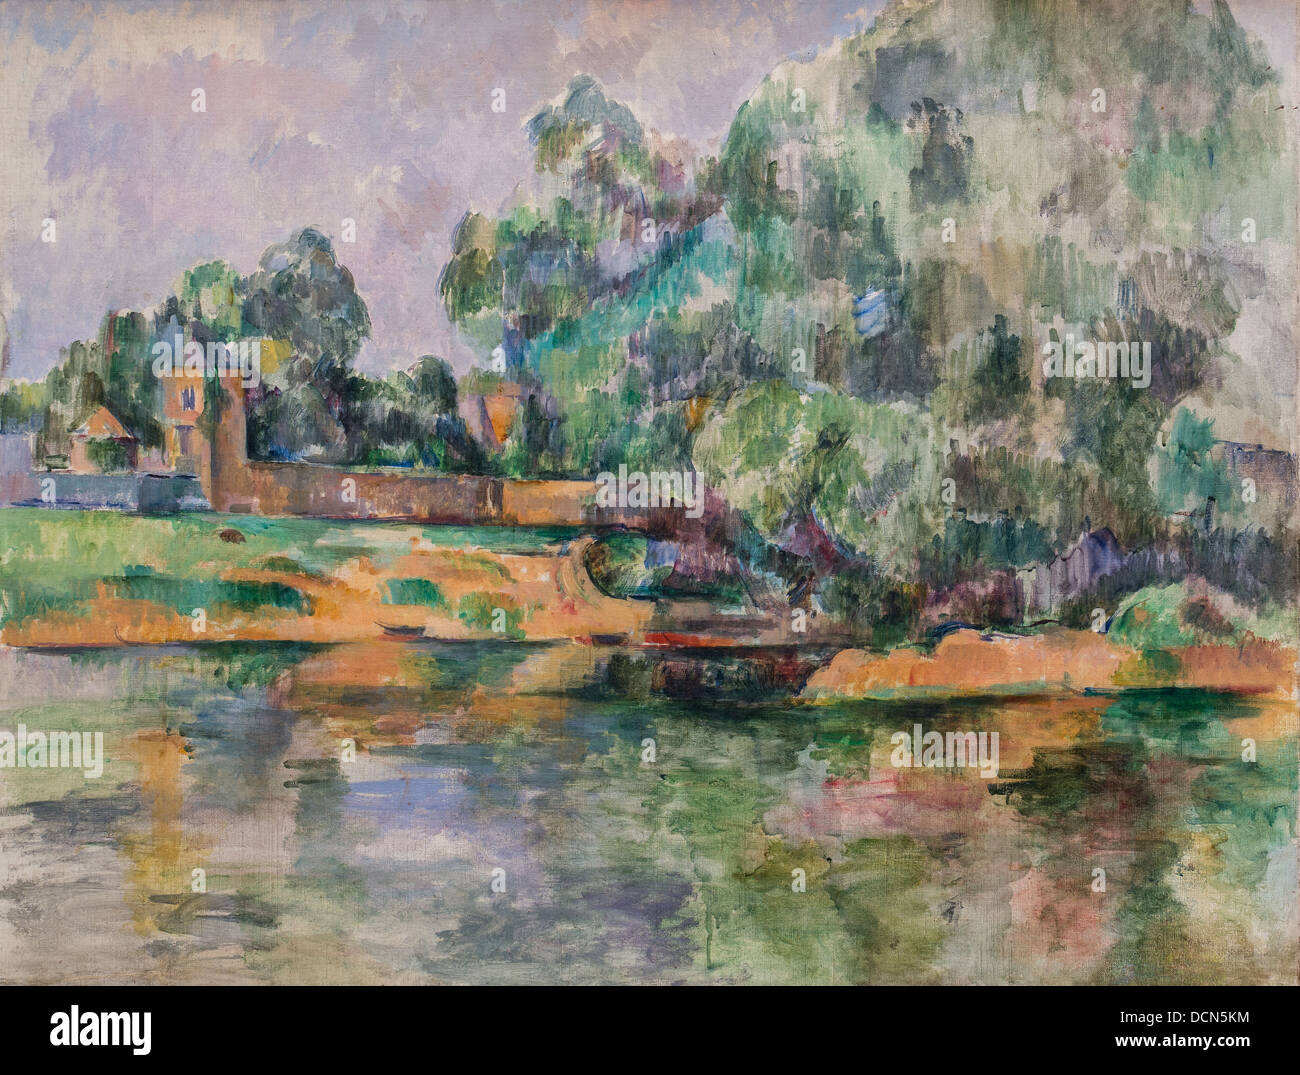 El siglo xix - Ribera - Paul Cézanne (1895) Philippe Sauvan-Magnet / Museo Activo Imagen De Stock